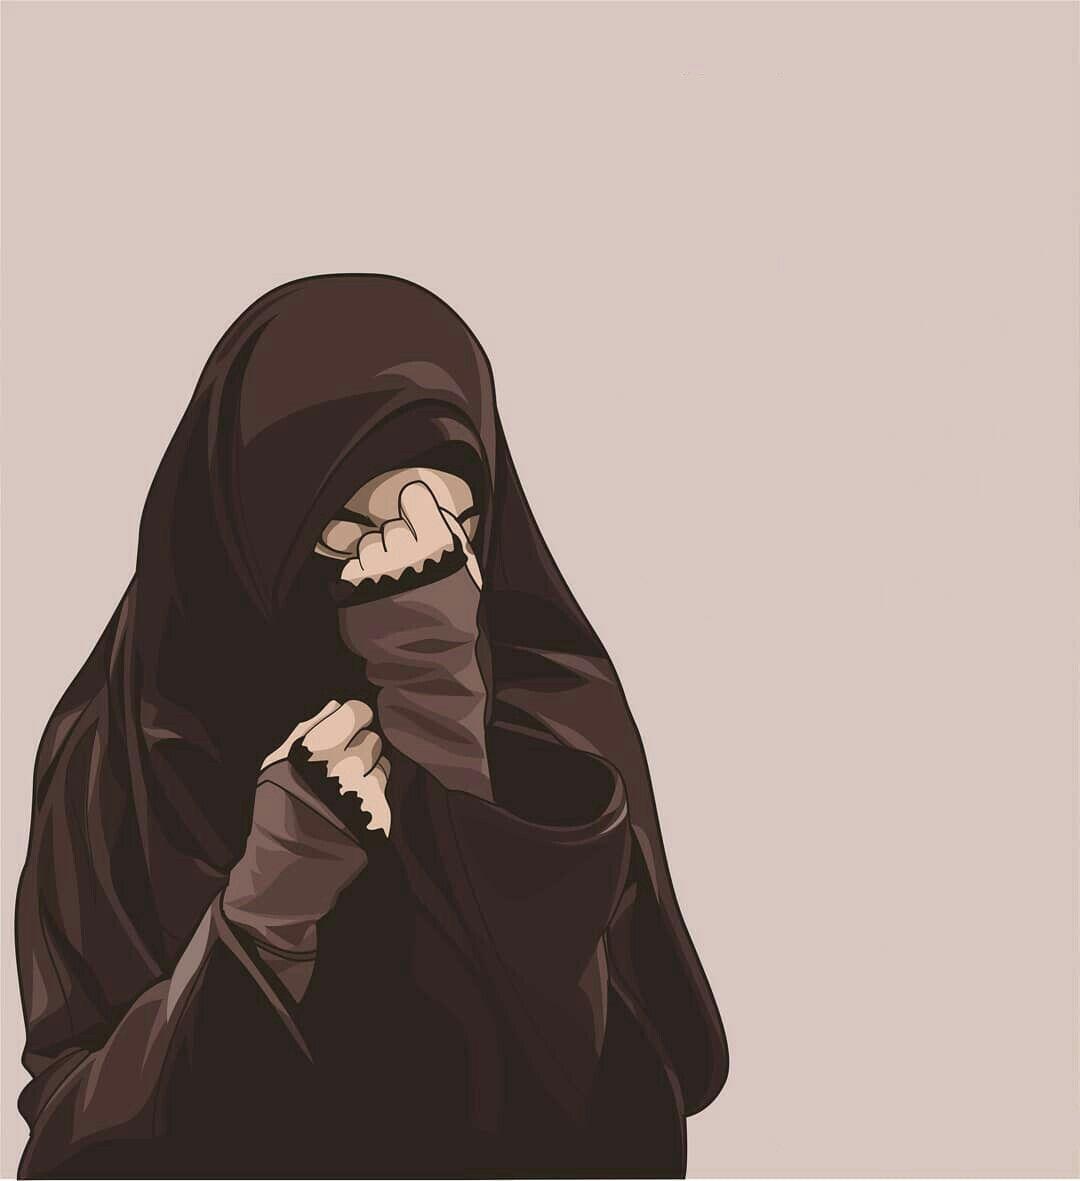 Pin Oleh Lala Chen Di Animasi Kartun Gambar Seni Islamis